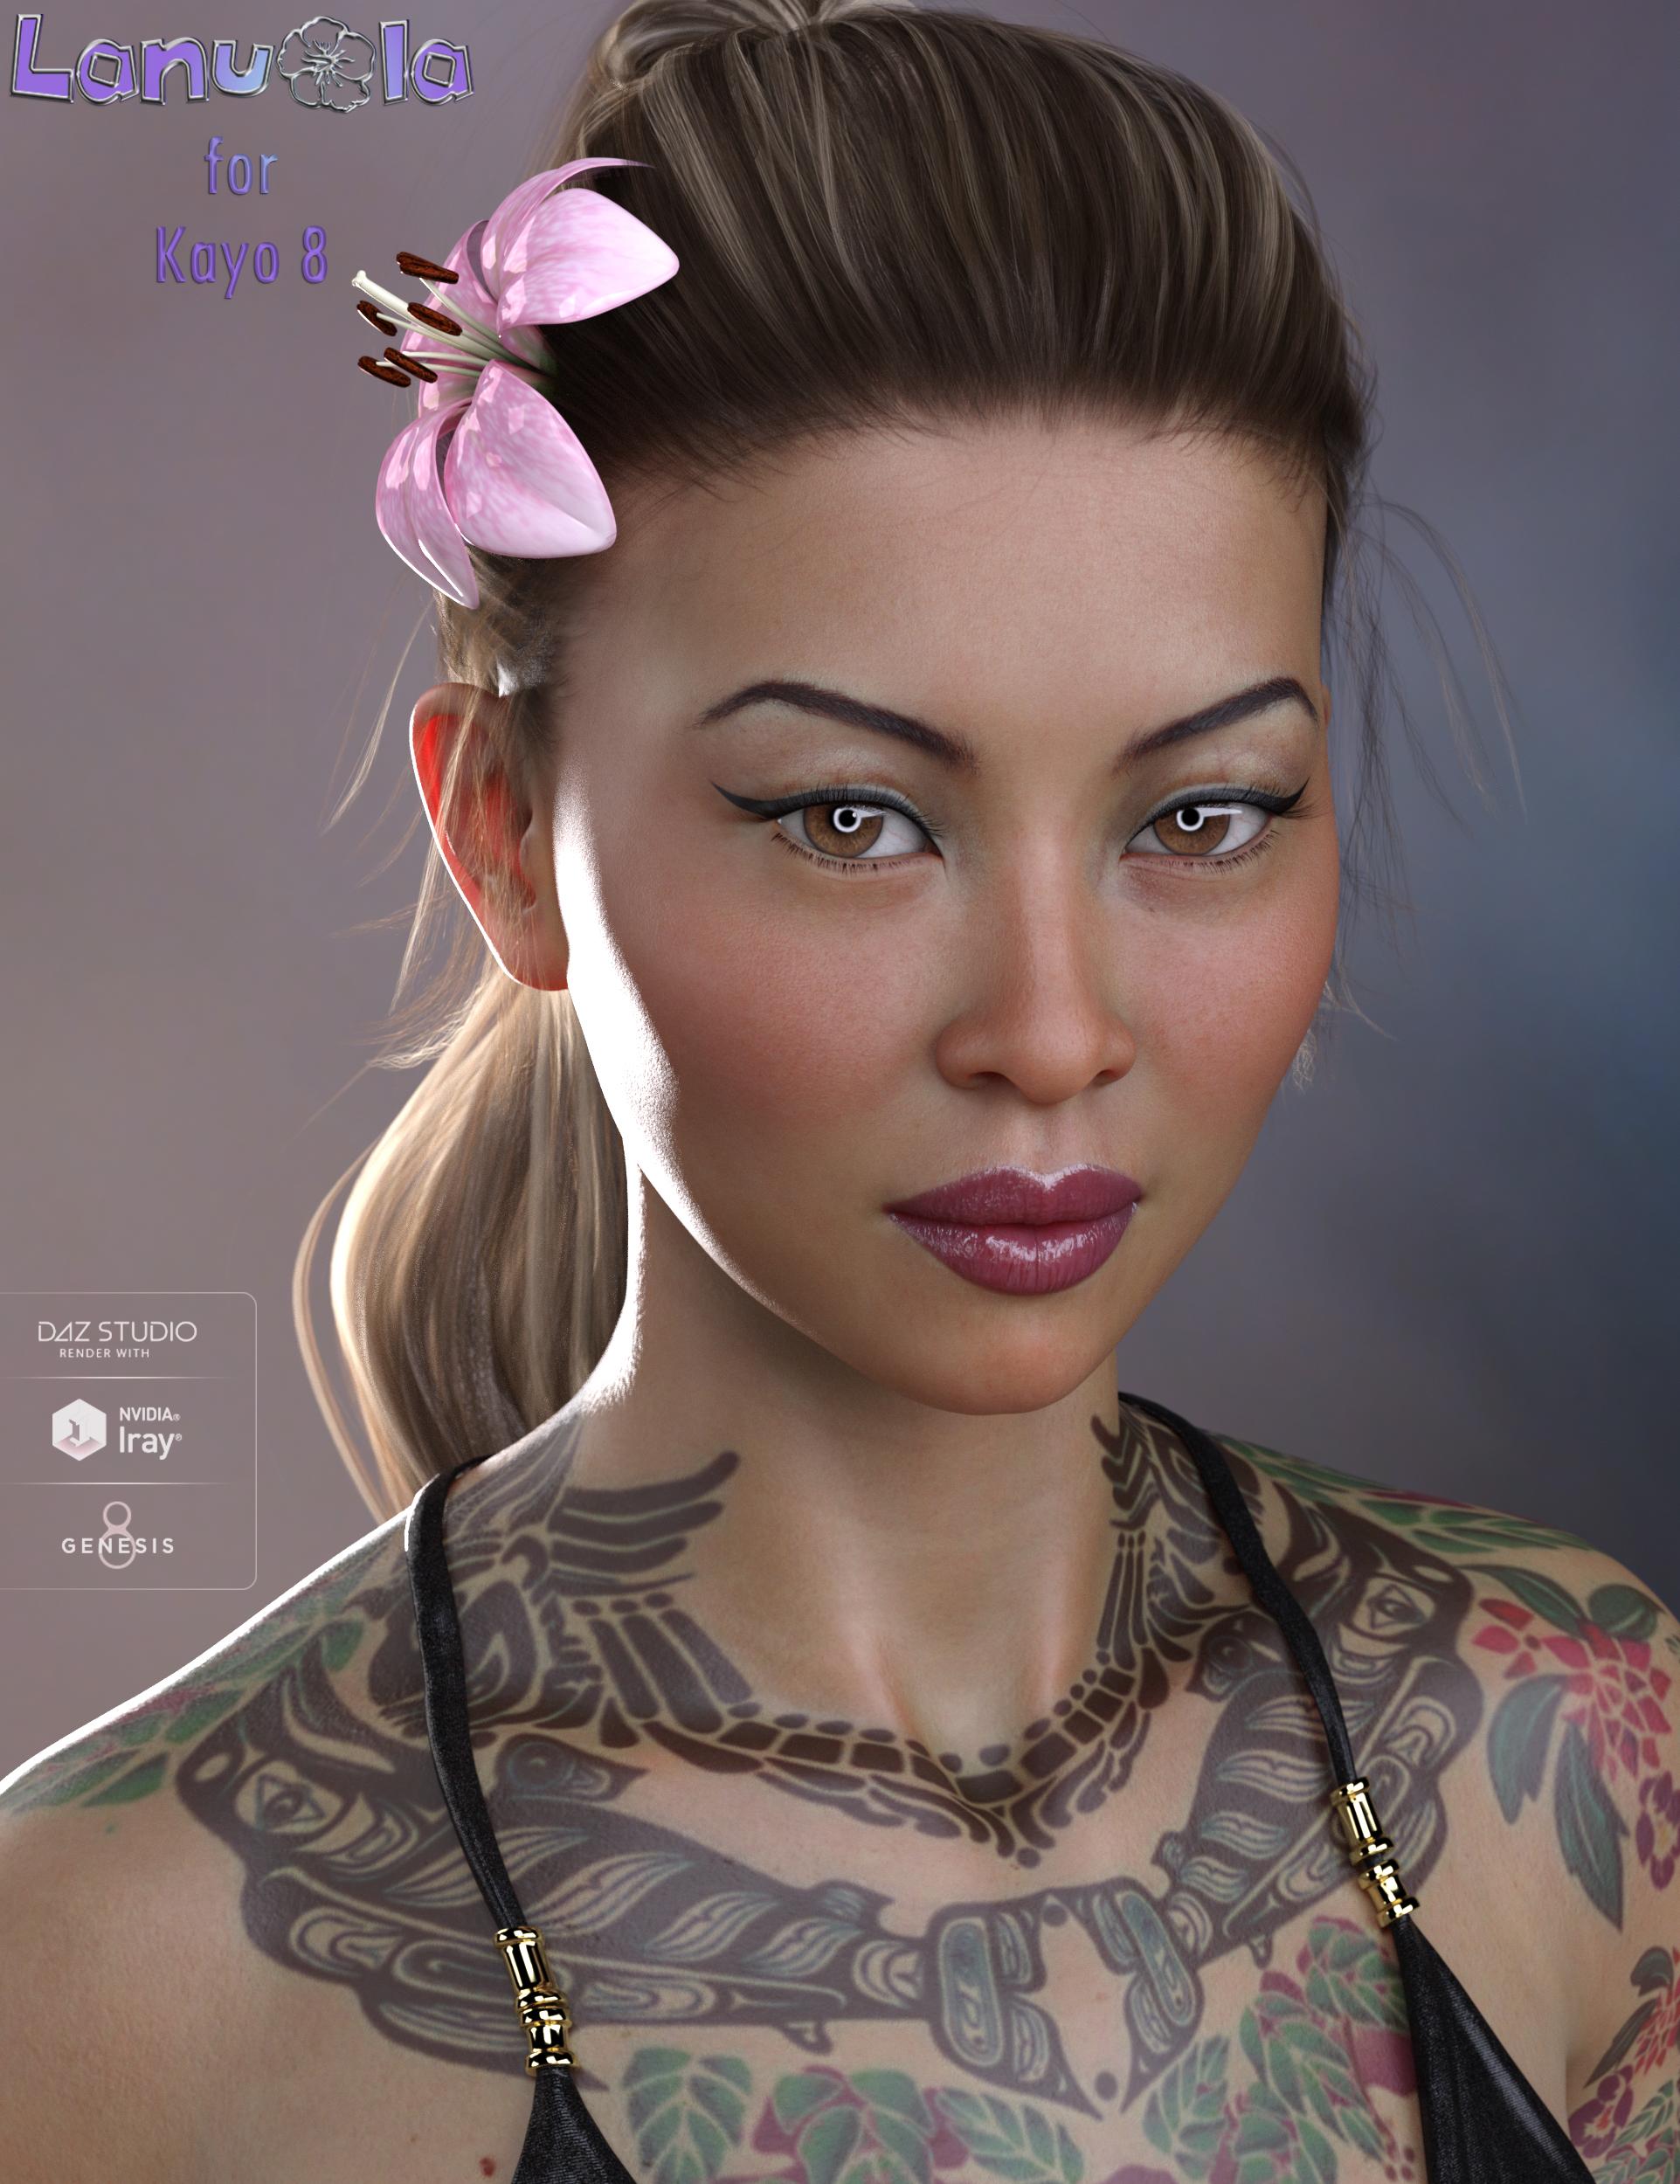 Lanuola HD for Kayo 8 by: MorrisEmrys, 3D Models by Daz 3D